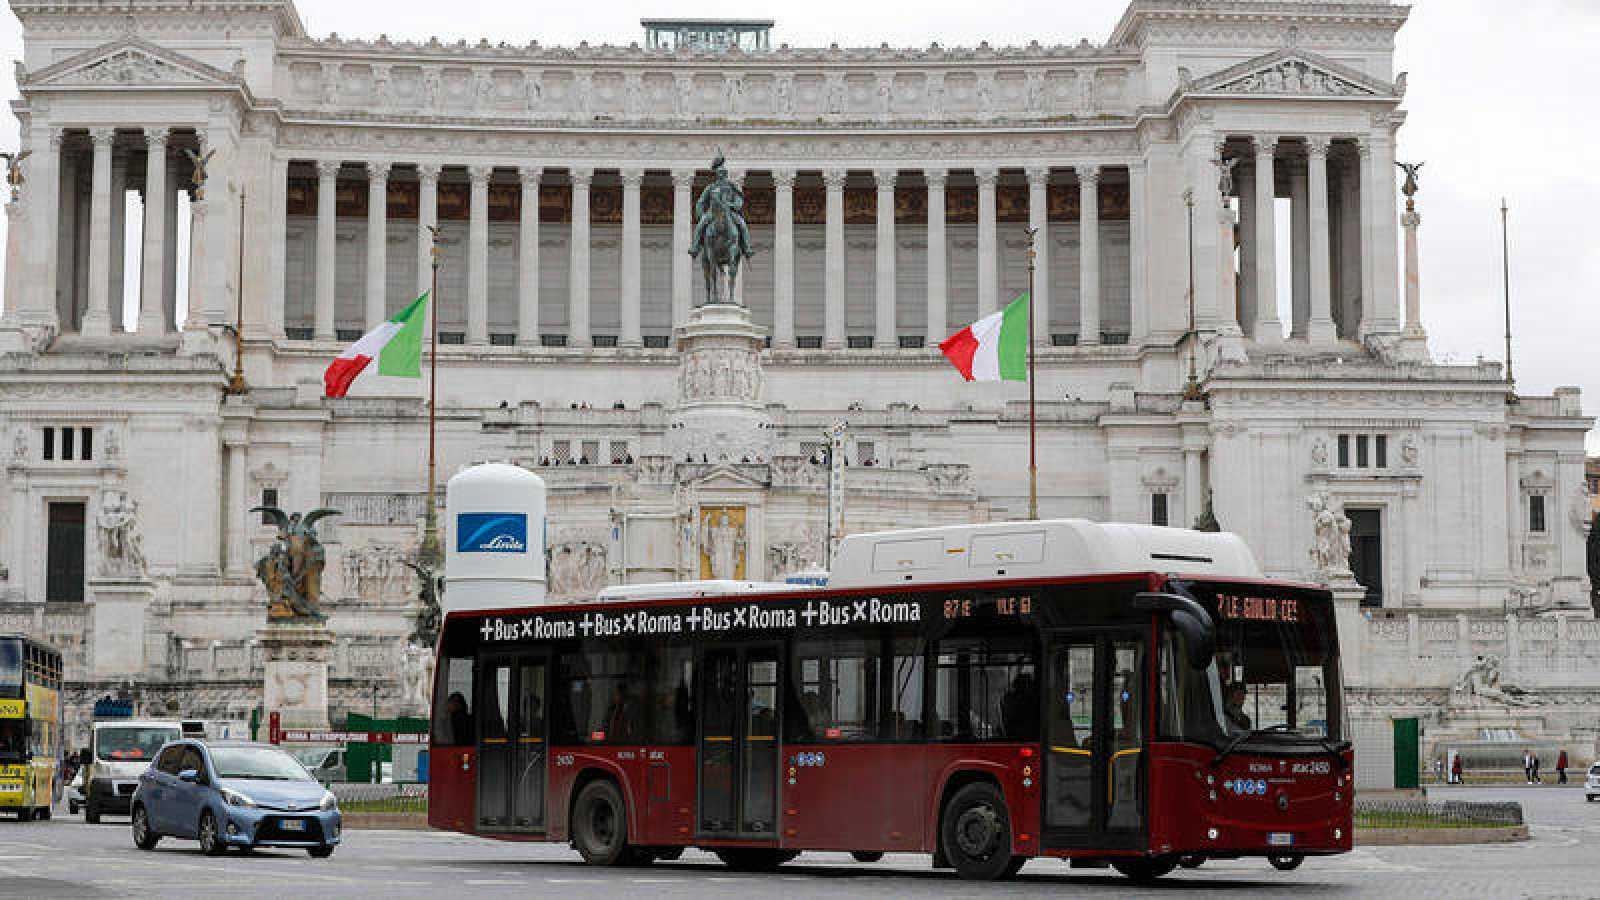 La plaza Venecia de Roma